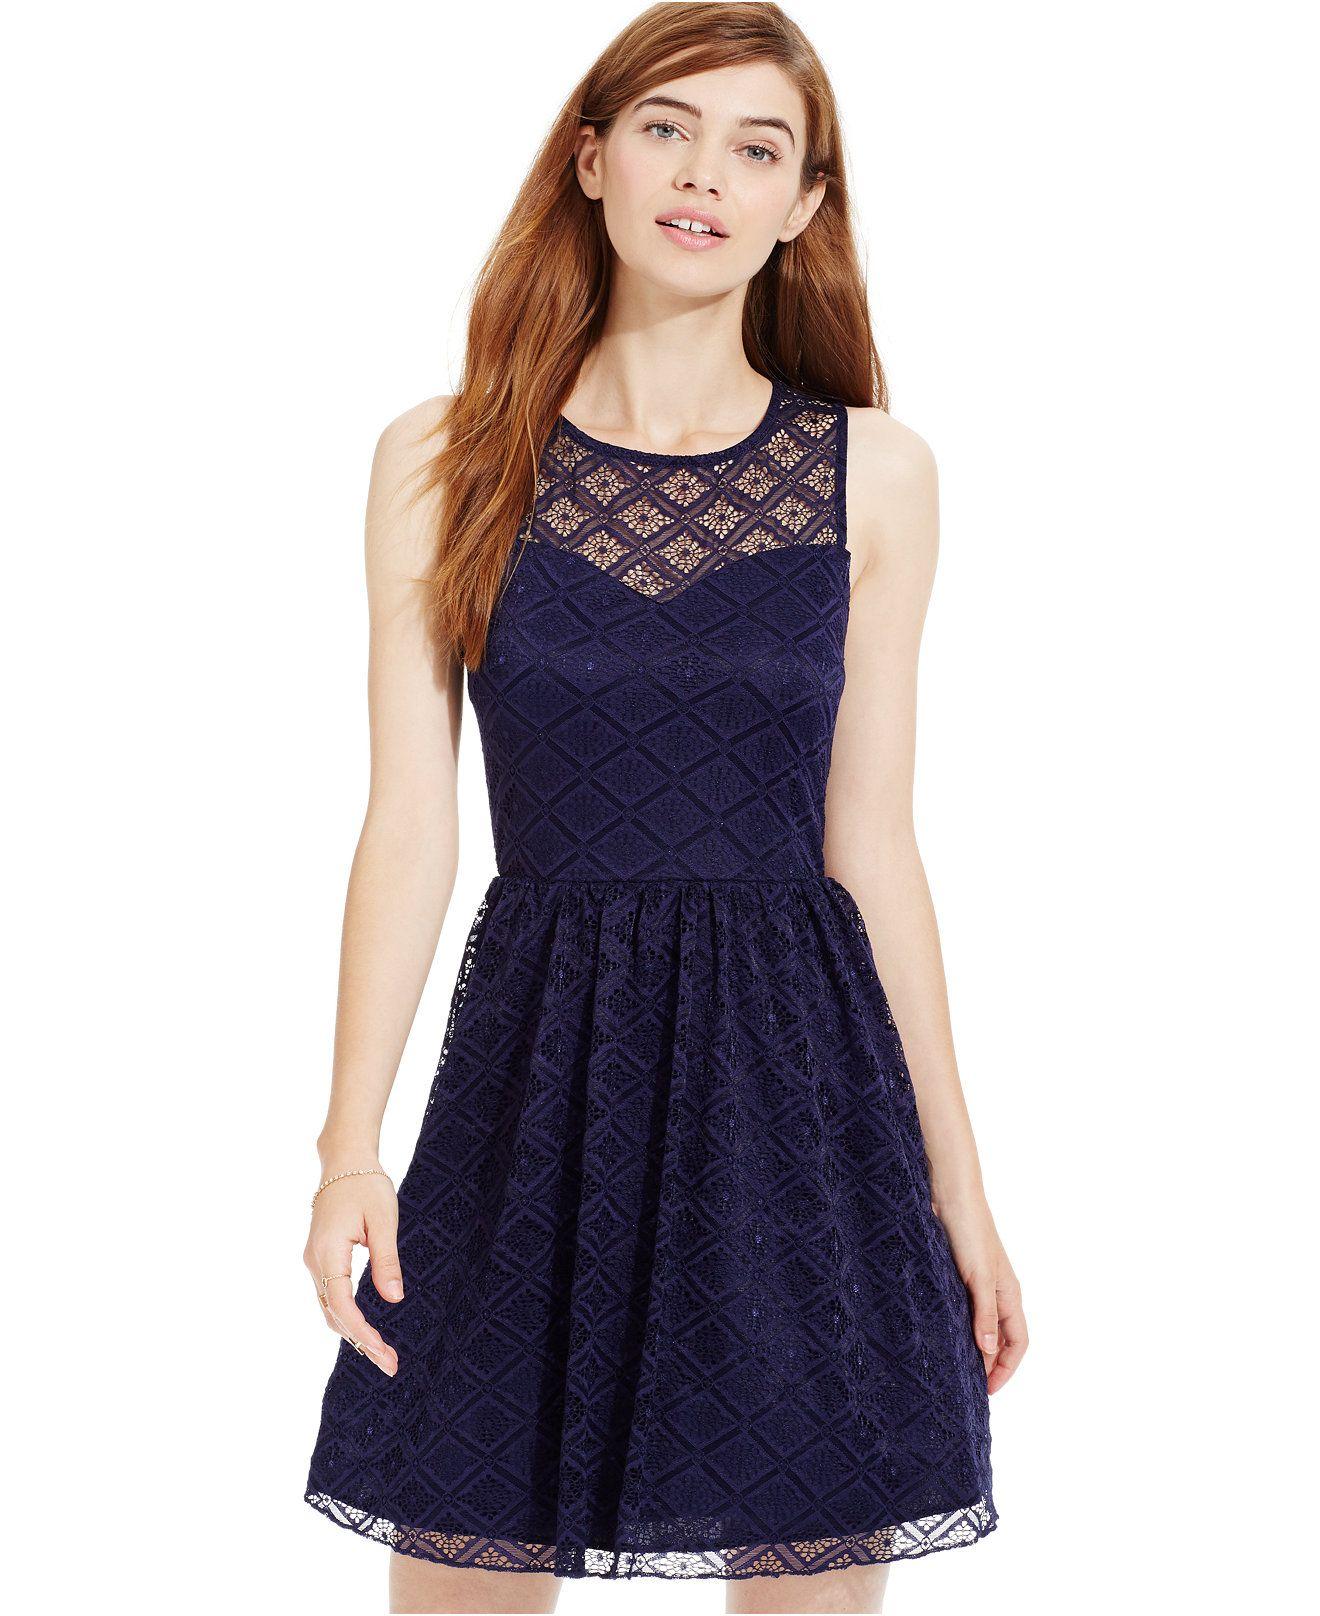 Trixxi Juniors\' Illusion Lace Cutout Dress - Juniors Dresses ...